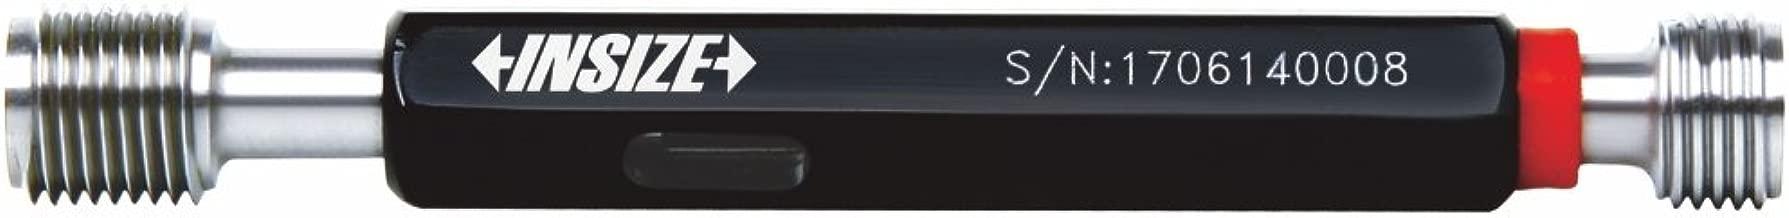 INSIZE 4130-6 Metric Thread Plug Gage, M6 x 1 mm